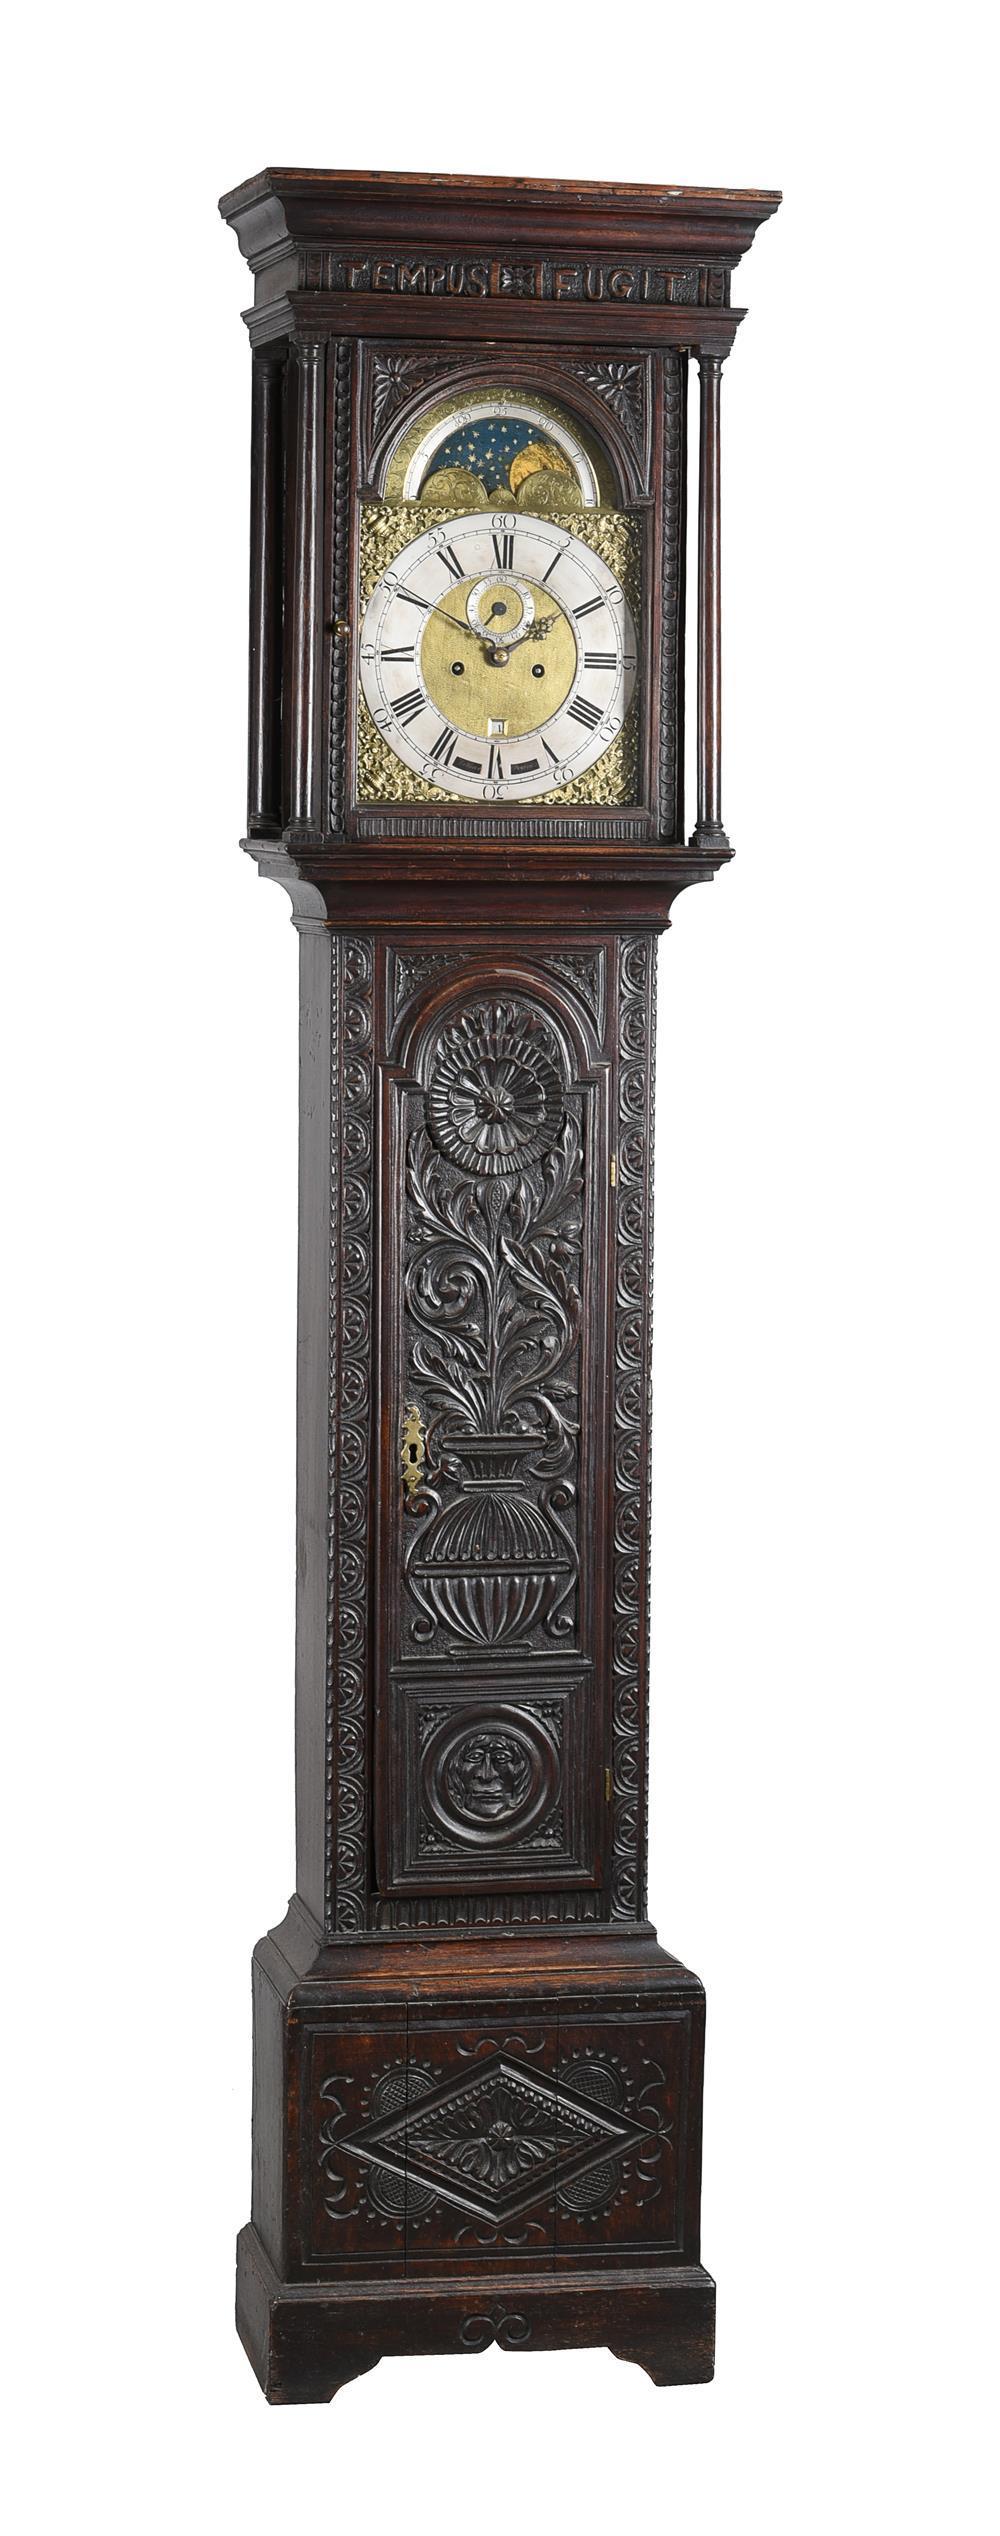 A carved oak longcase clock